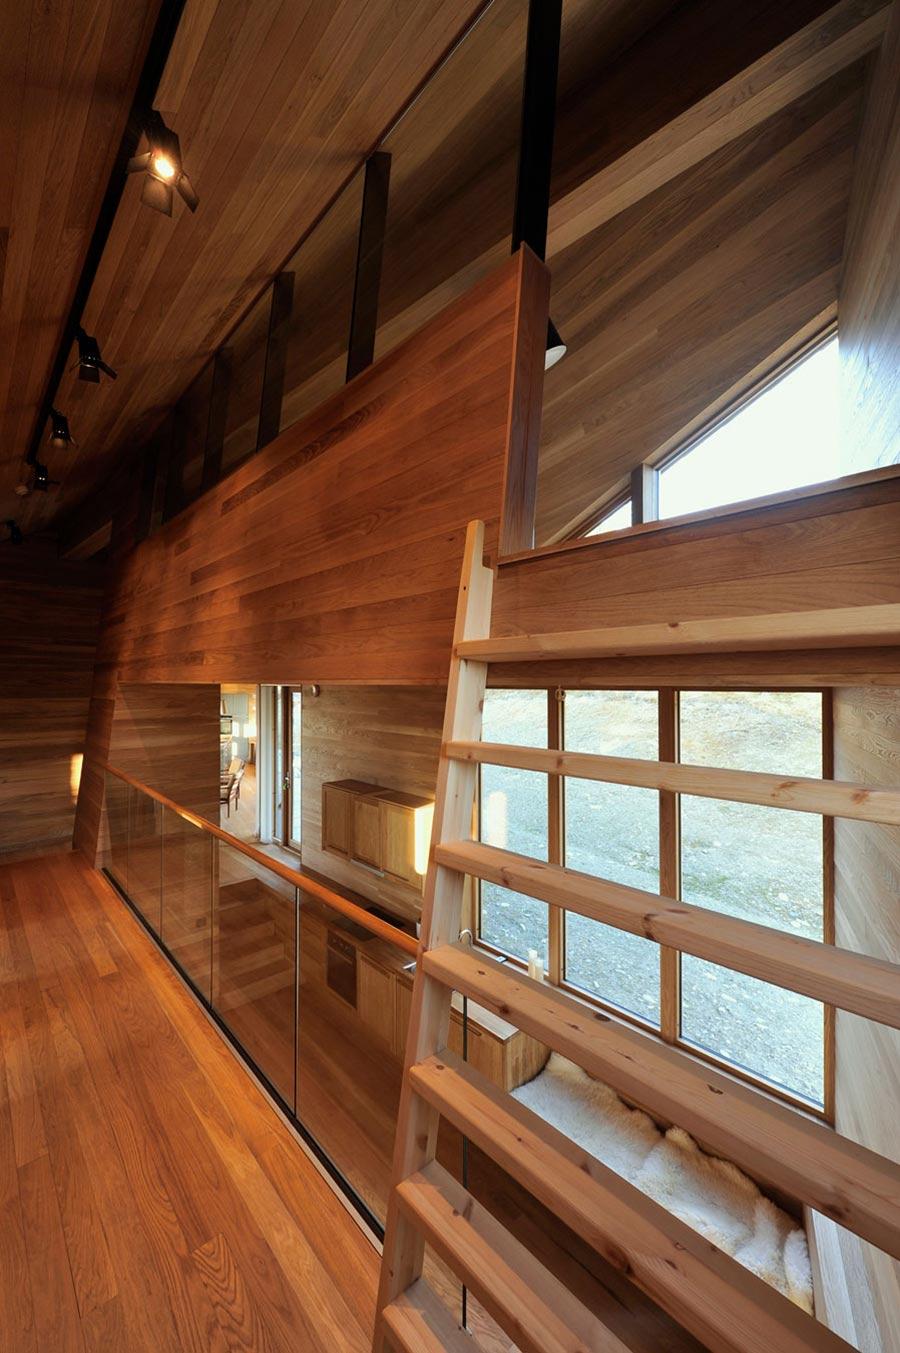 Oak Interior, Ski Home in Kvitfjell, Norway: Twisted Cabin